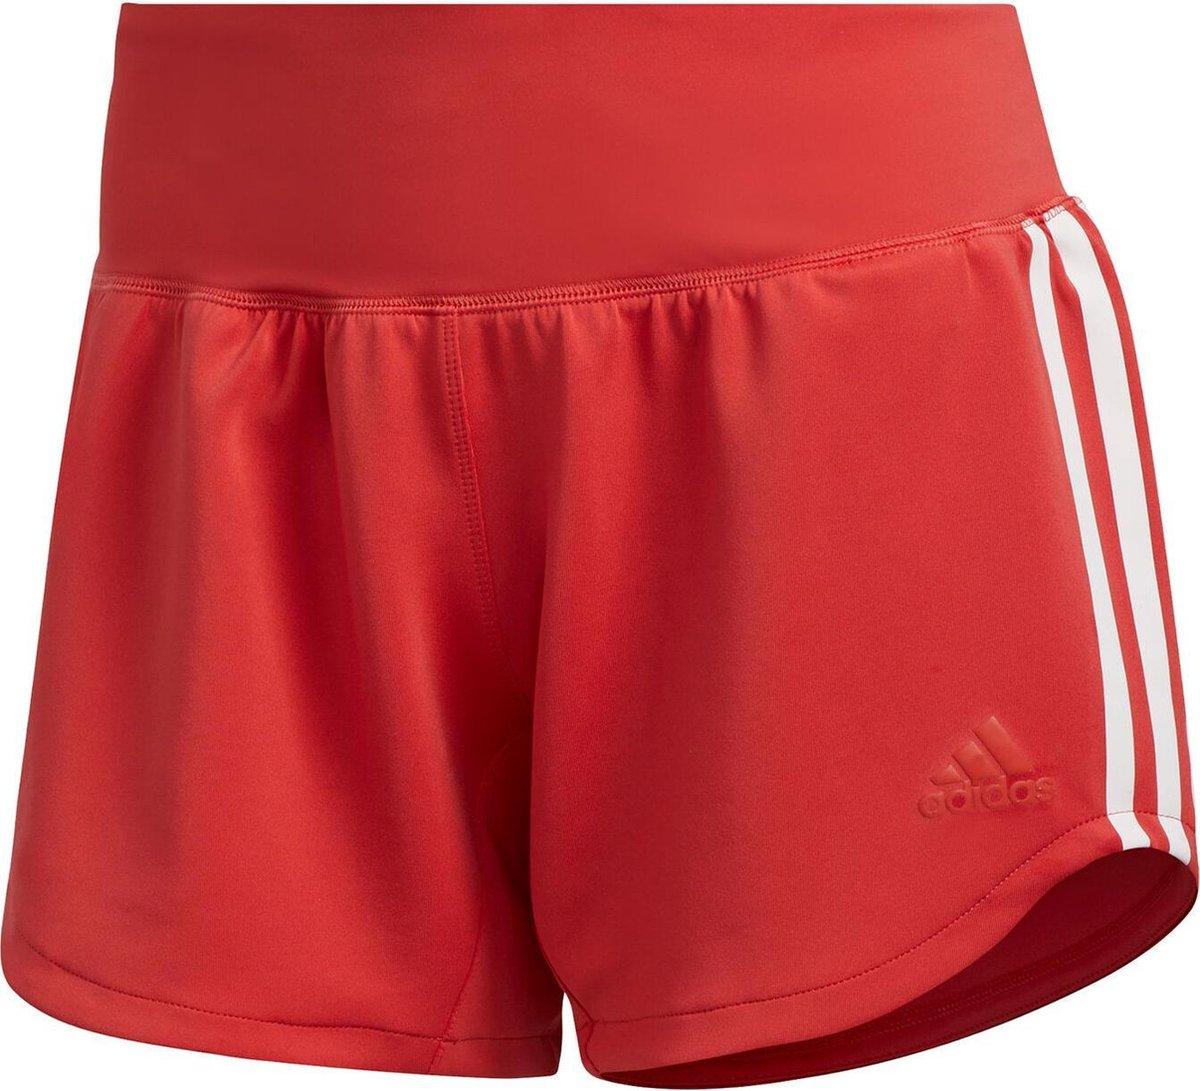   adidas 3 Stripes Woven Gym short dames rozewit